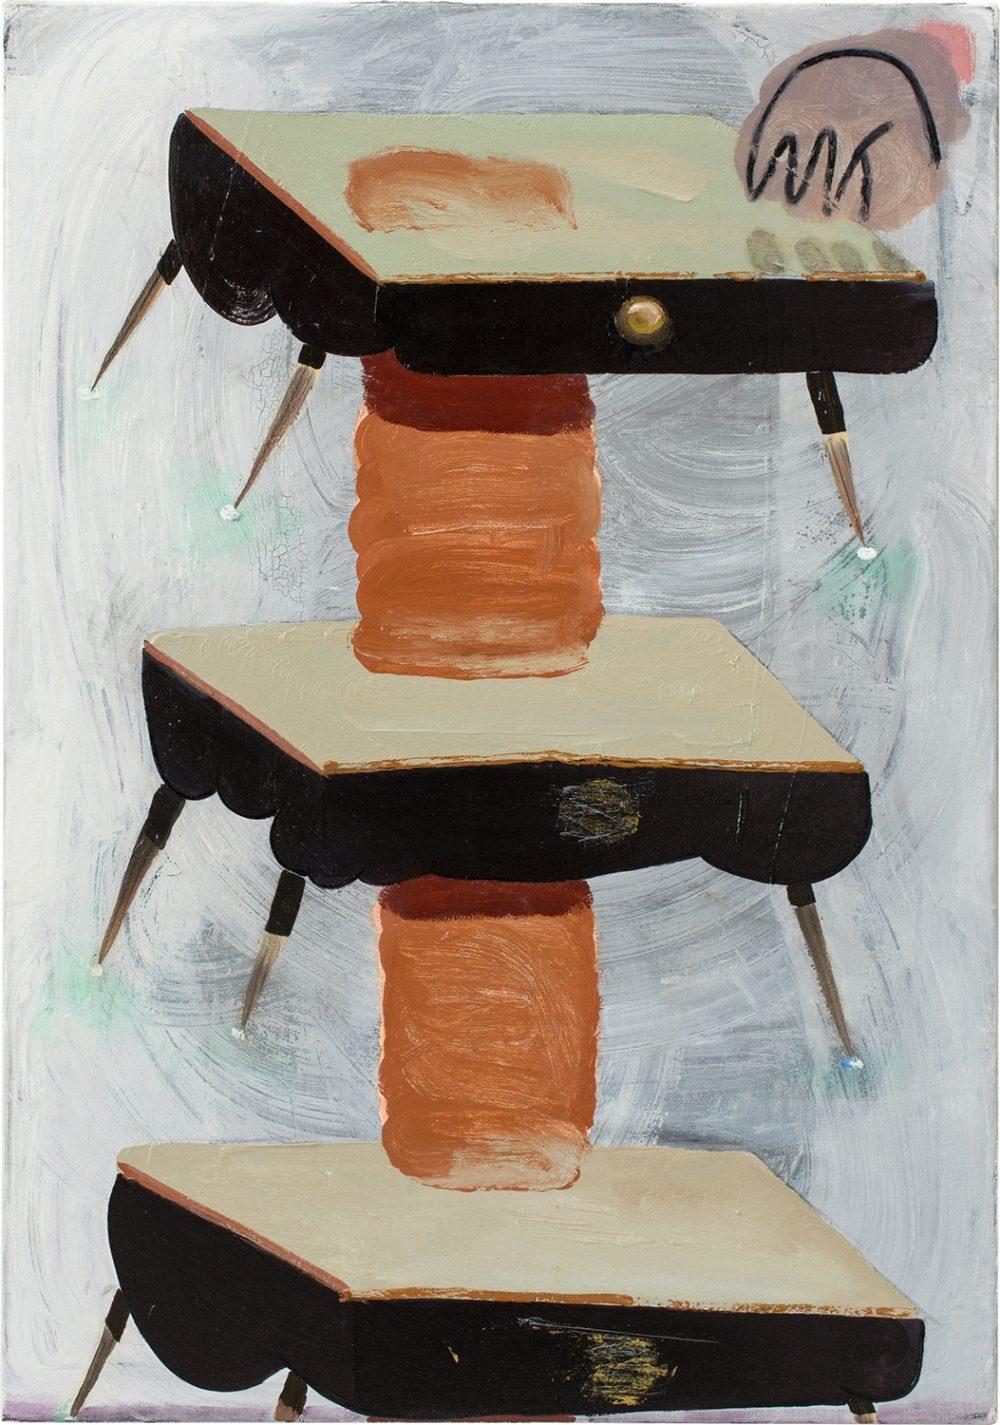 o.T. 55 (2017), Öl, Lack, Kohle auf Leinwand, 100 x 70 cm